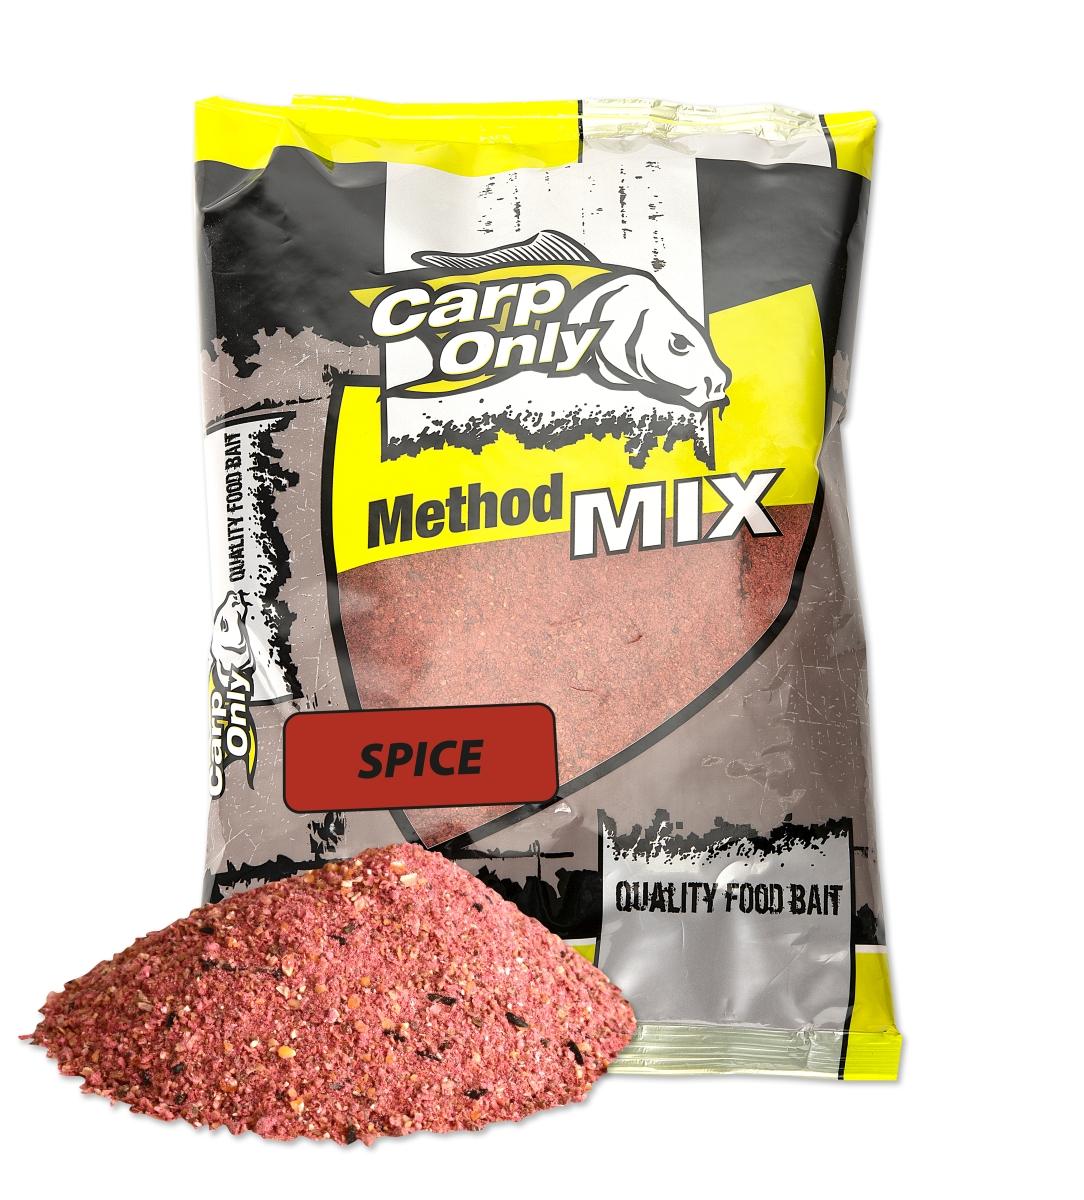 Method mix Carp Only Spice 1kg